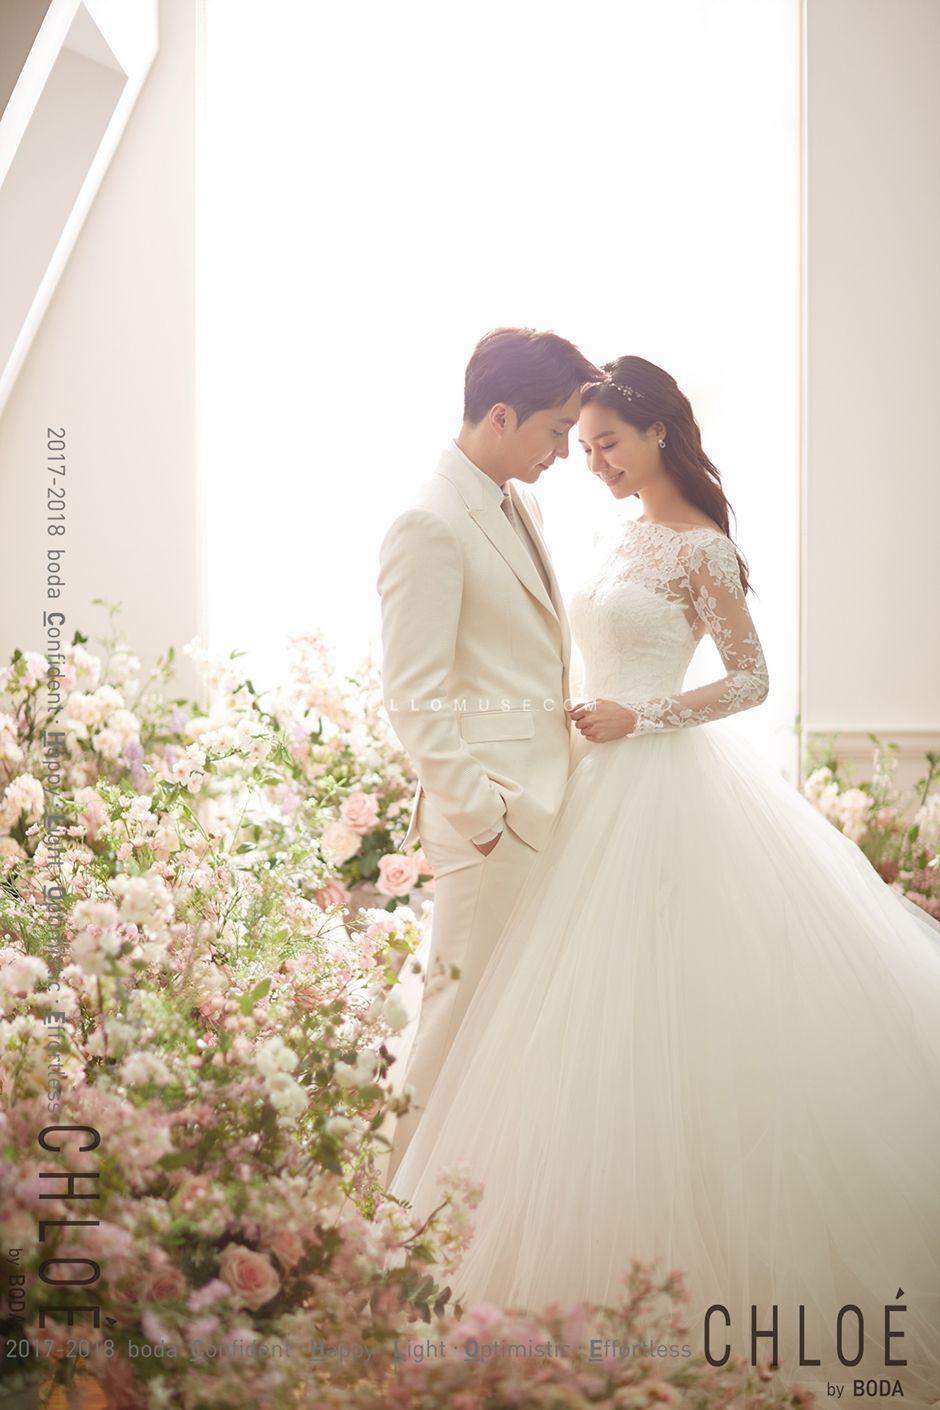 Pin By Alexbuntha On Studio Pinterest Wedding Wedding Photos